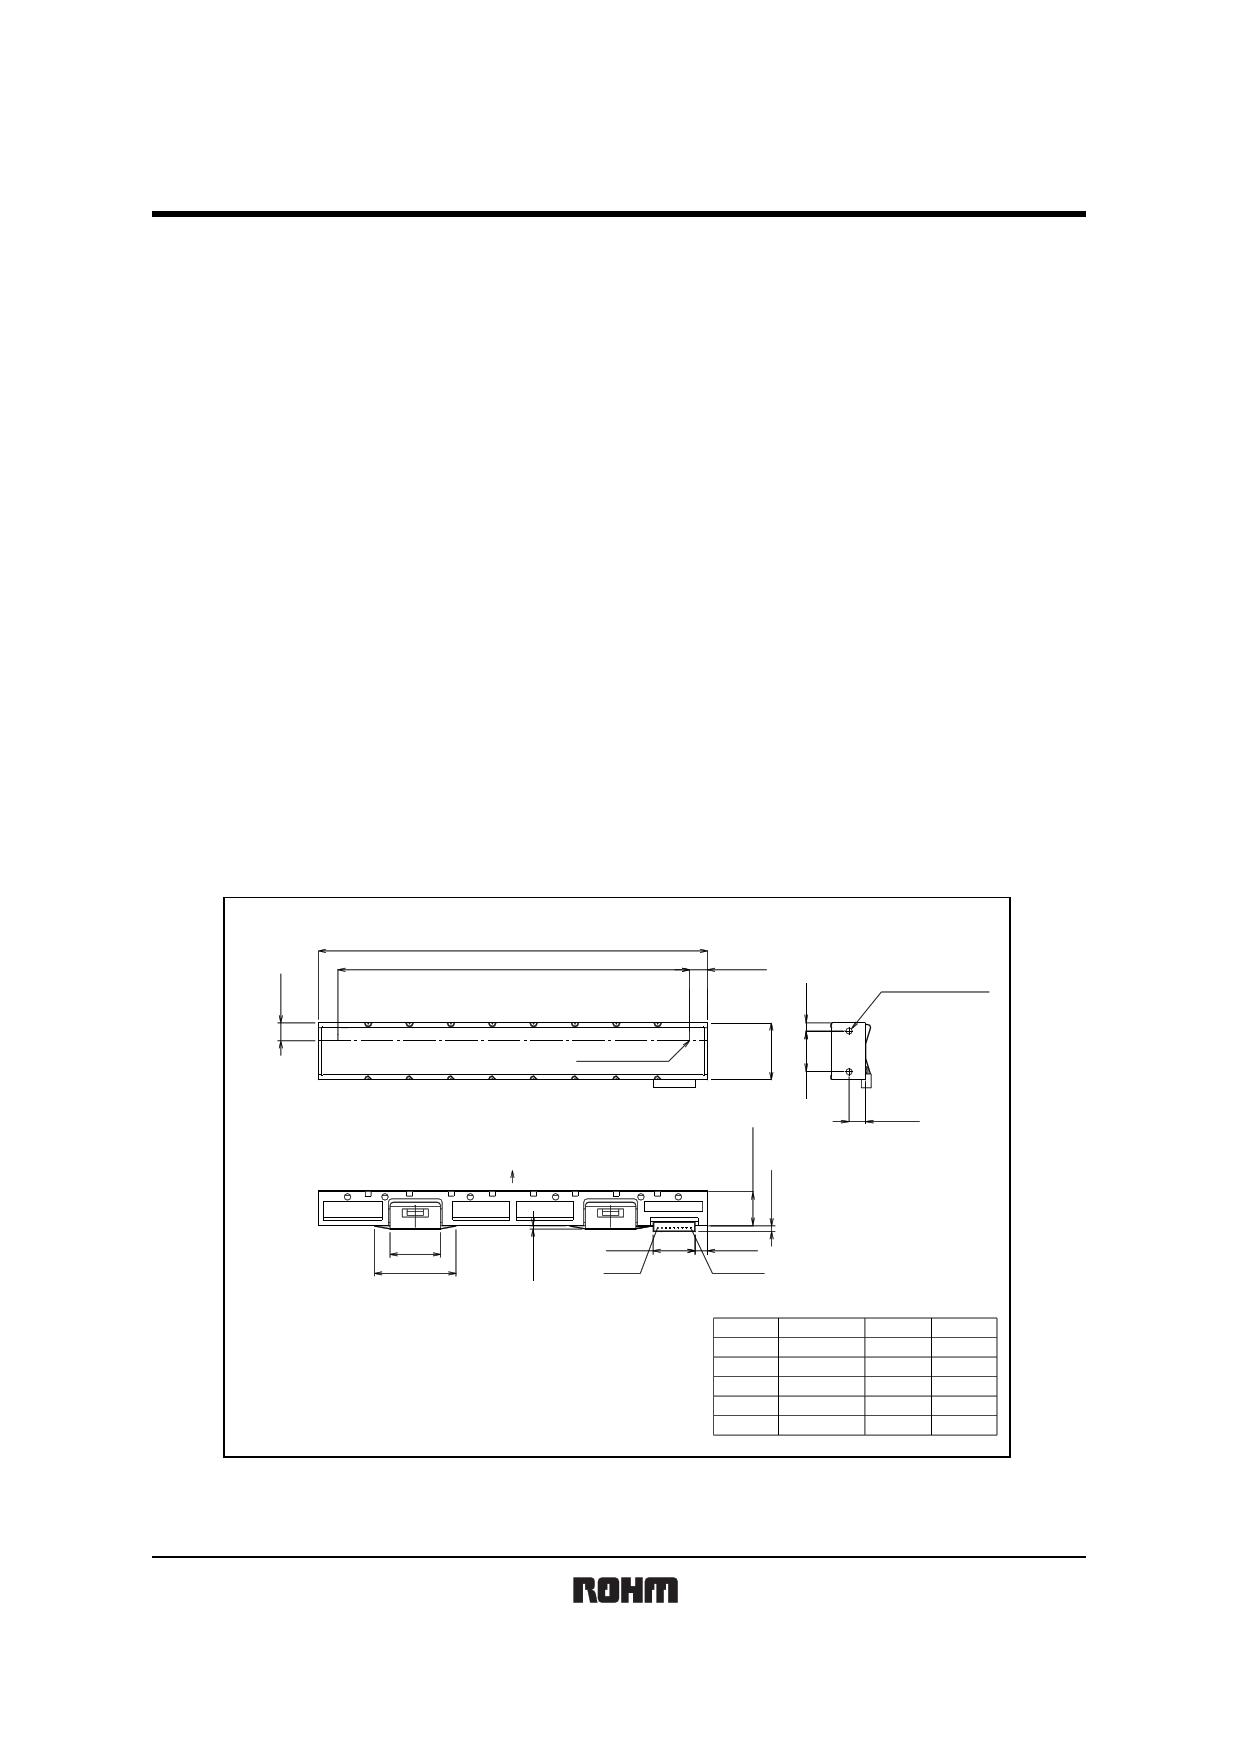 IA3004-ME10A دیتاشیت PDF